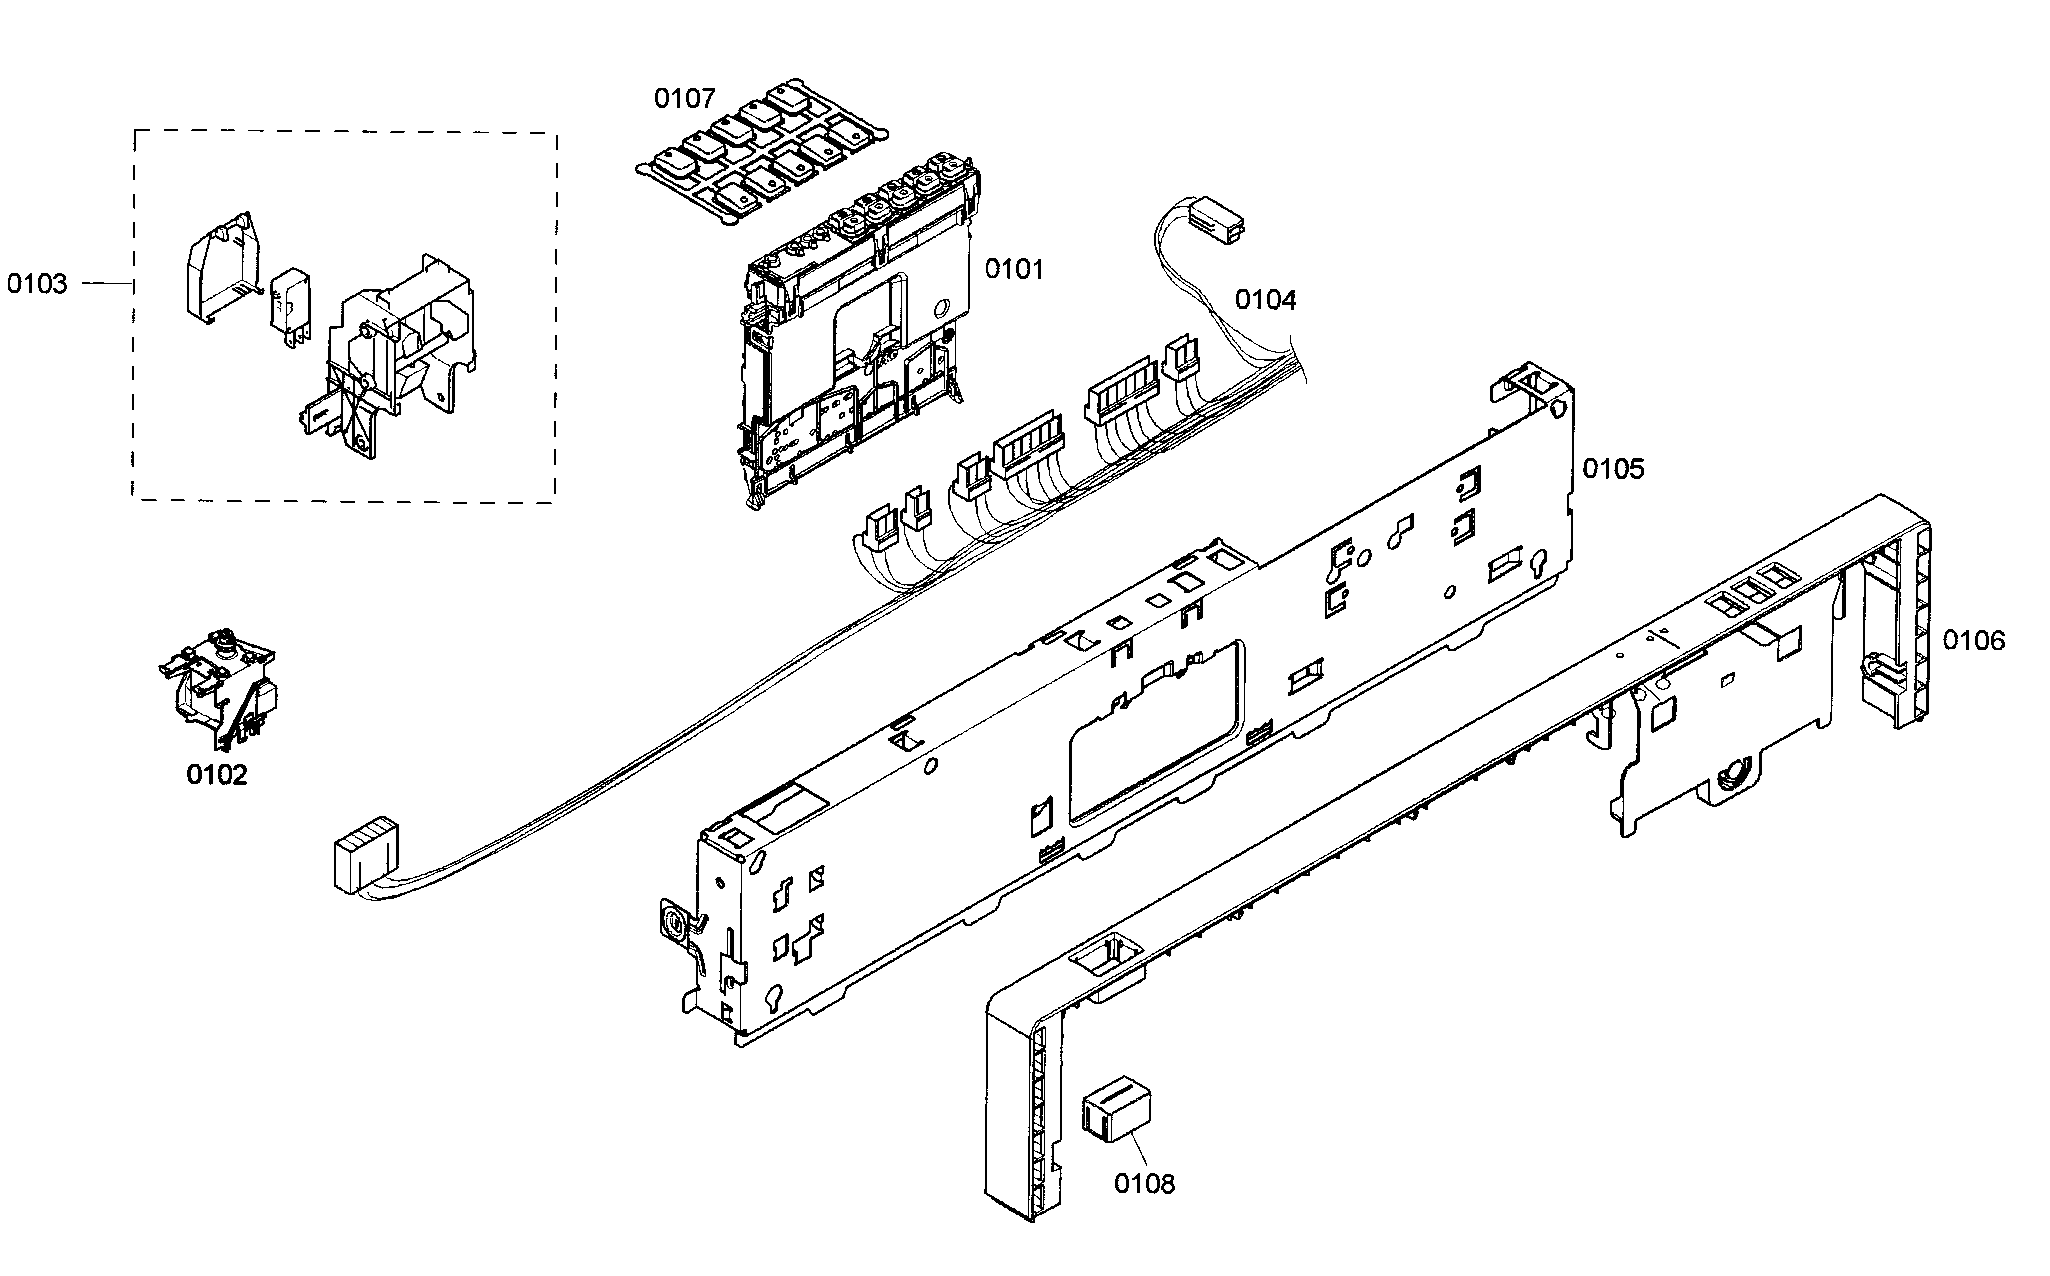 bosch exxcel dishwasher parts diagram passat 1 8t engine list